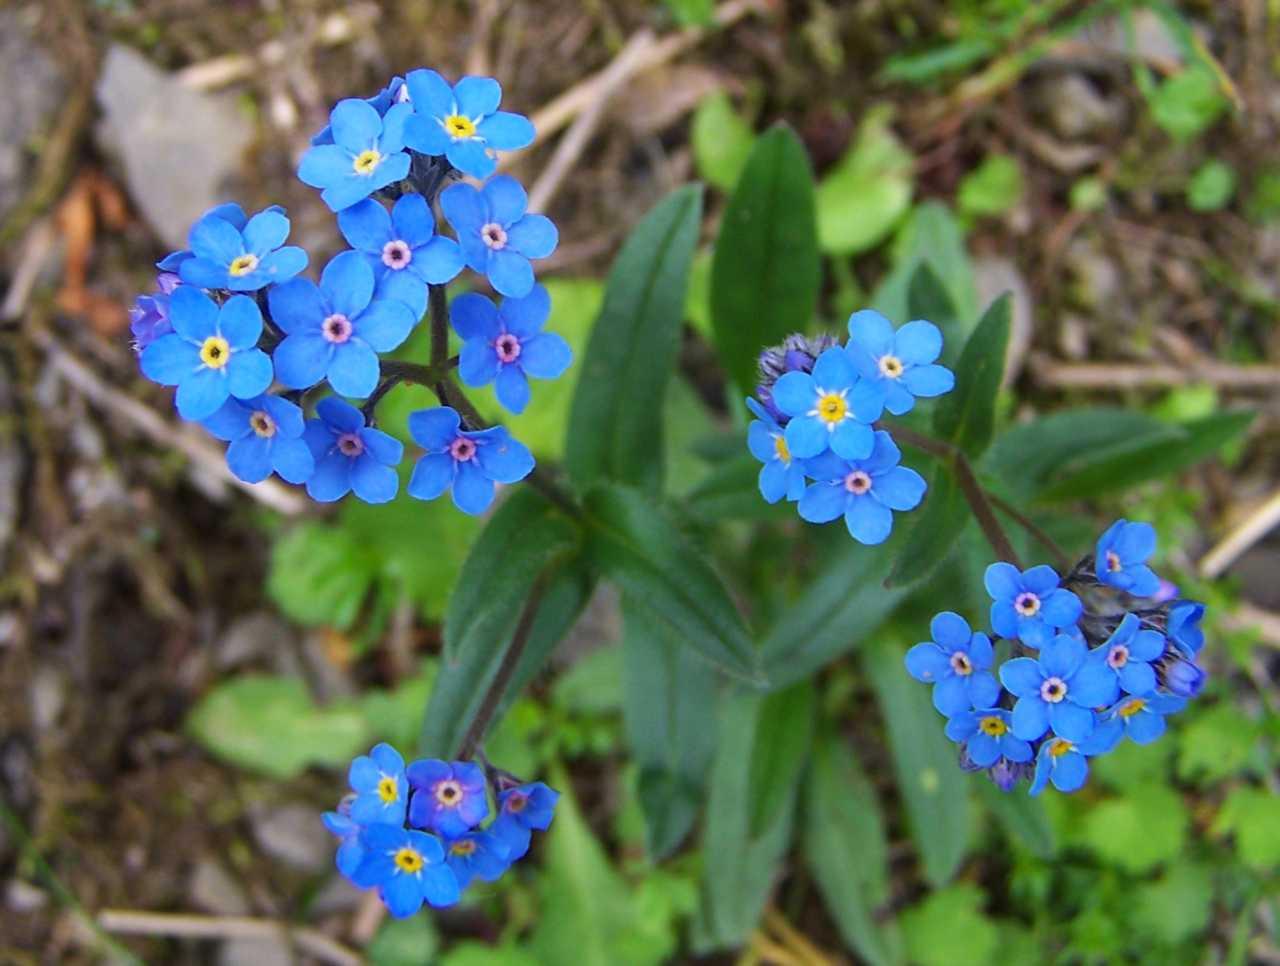 Myosotis - Forget-Me-Not – Calgary Plants Online Garden Centre